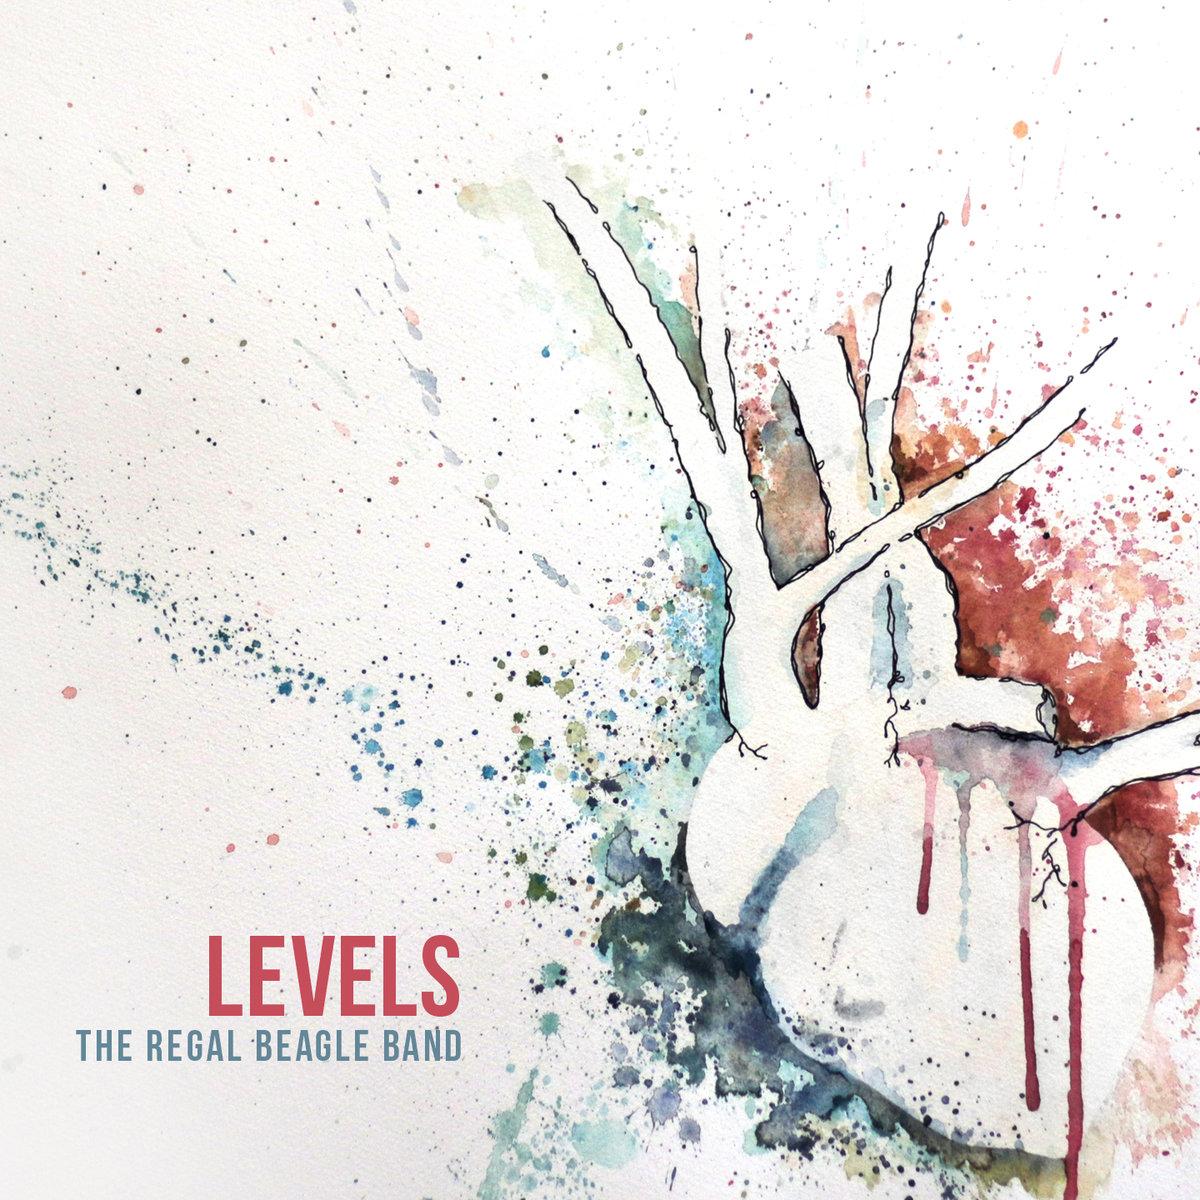 regalbeagleband_levels.jpg